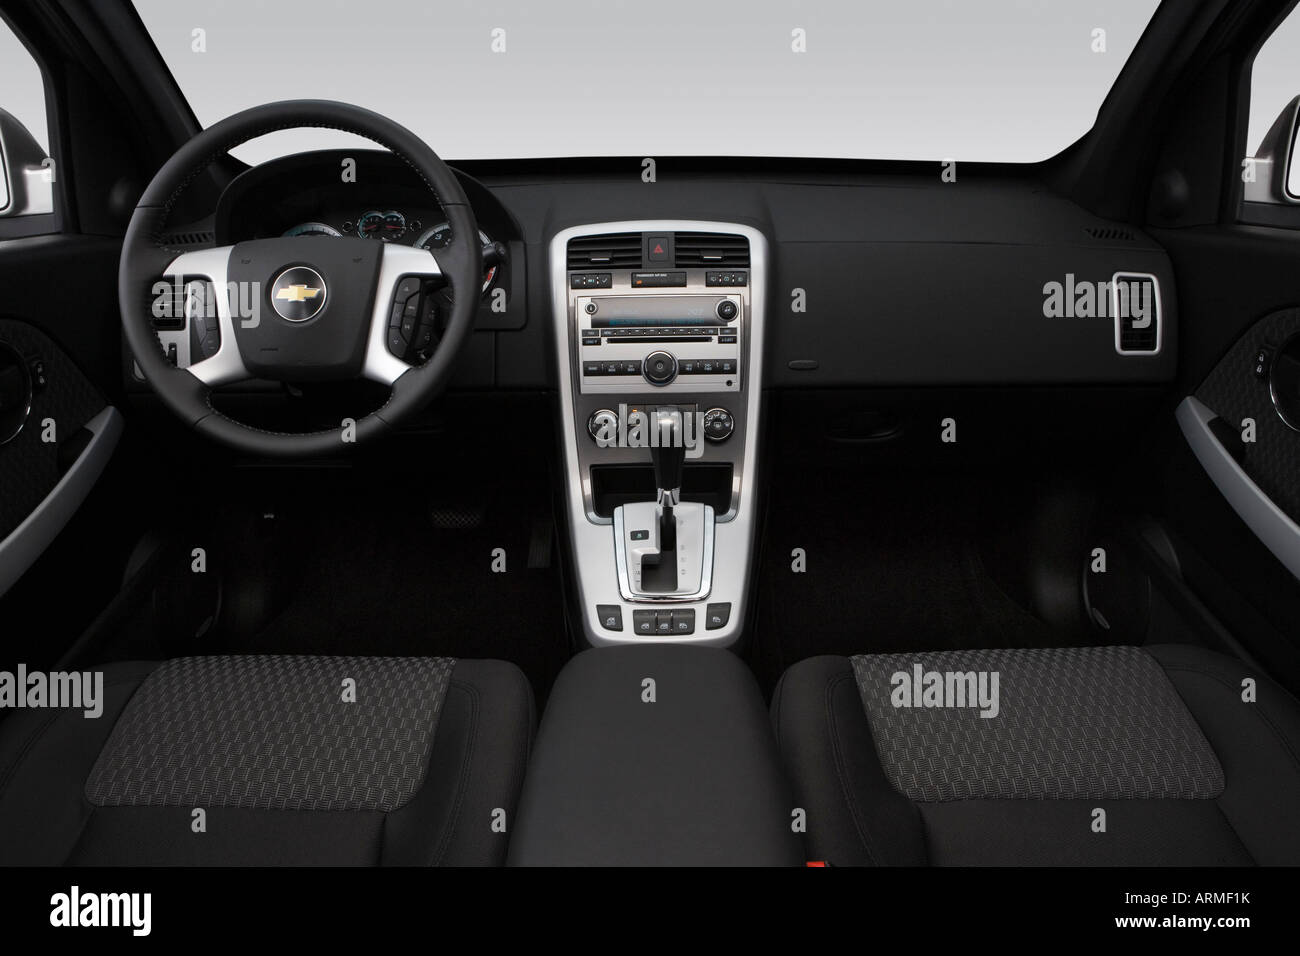 Equinox 2008 chevy equinox : 2008 Chevrolet Equinox Sport in Silver - Dashboard, center console ...